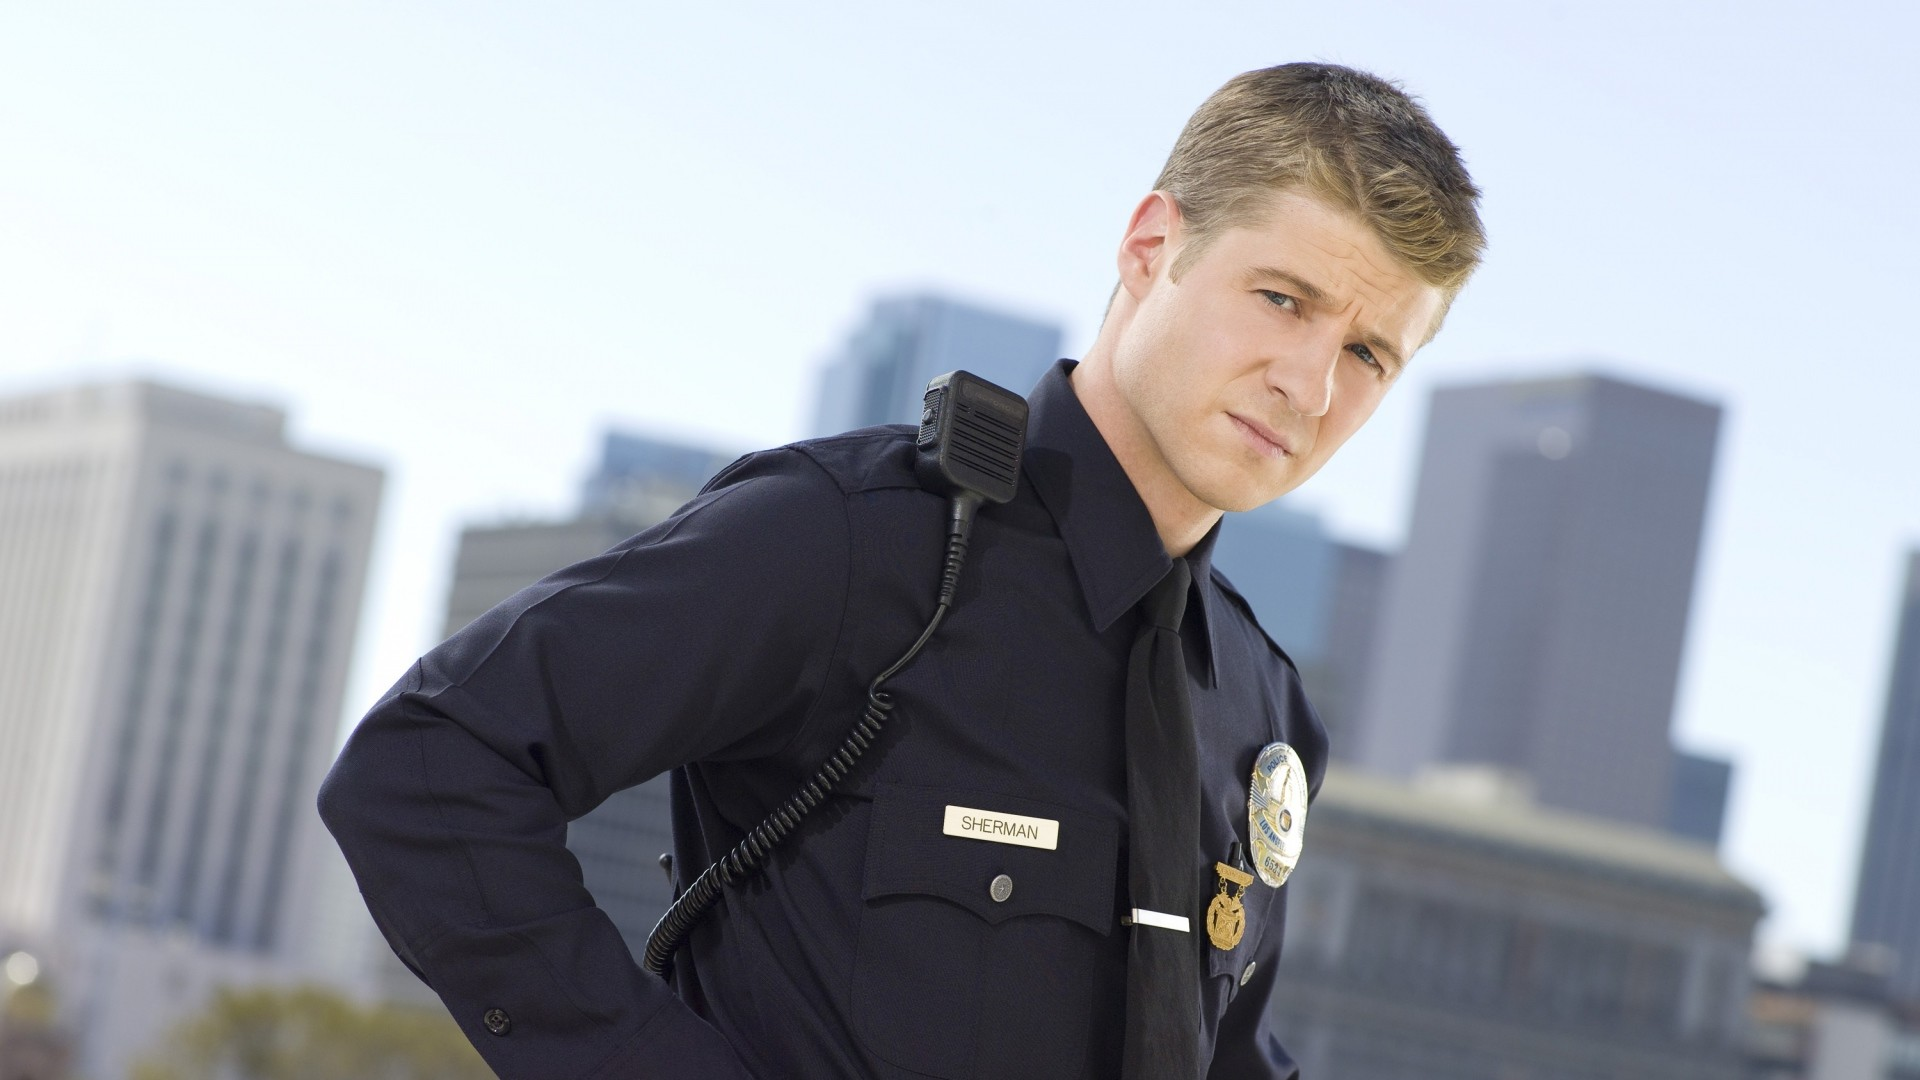 … benjamin mckenzie, man, police